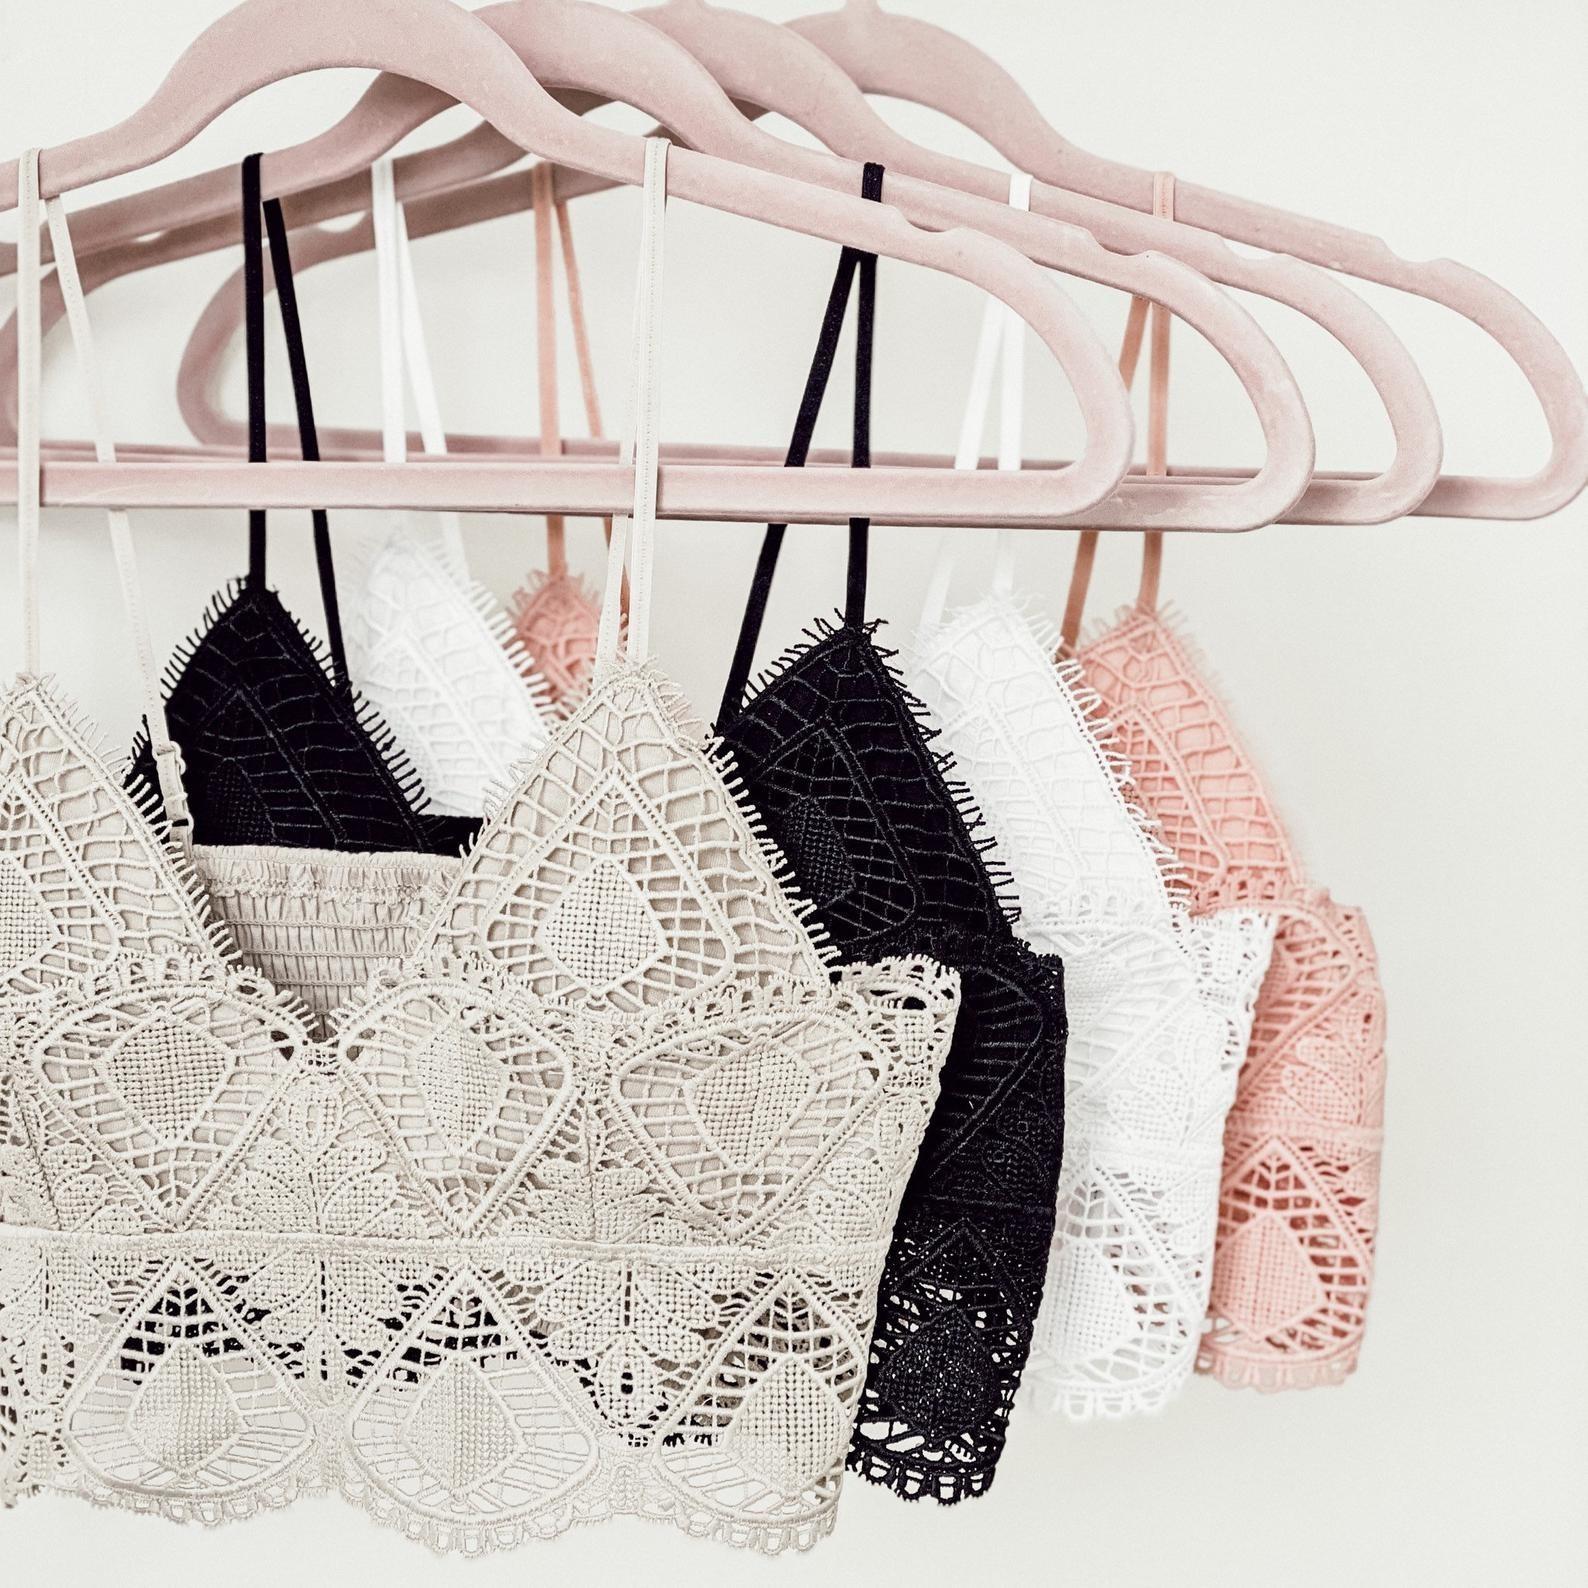 longline lace bralettes